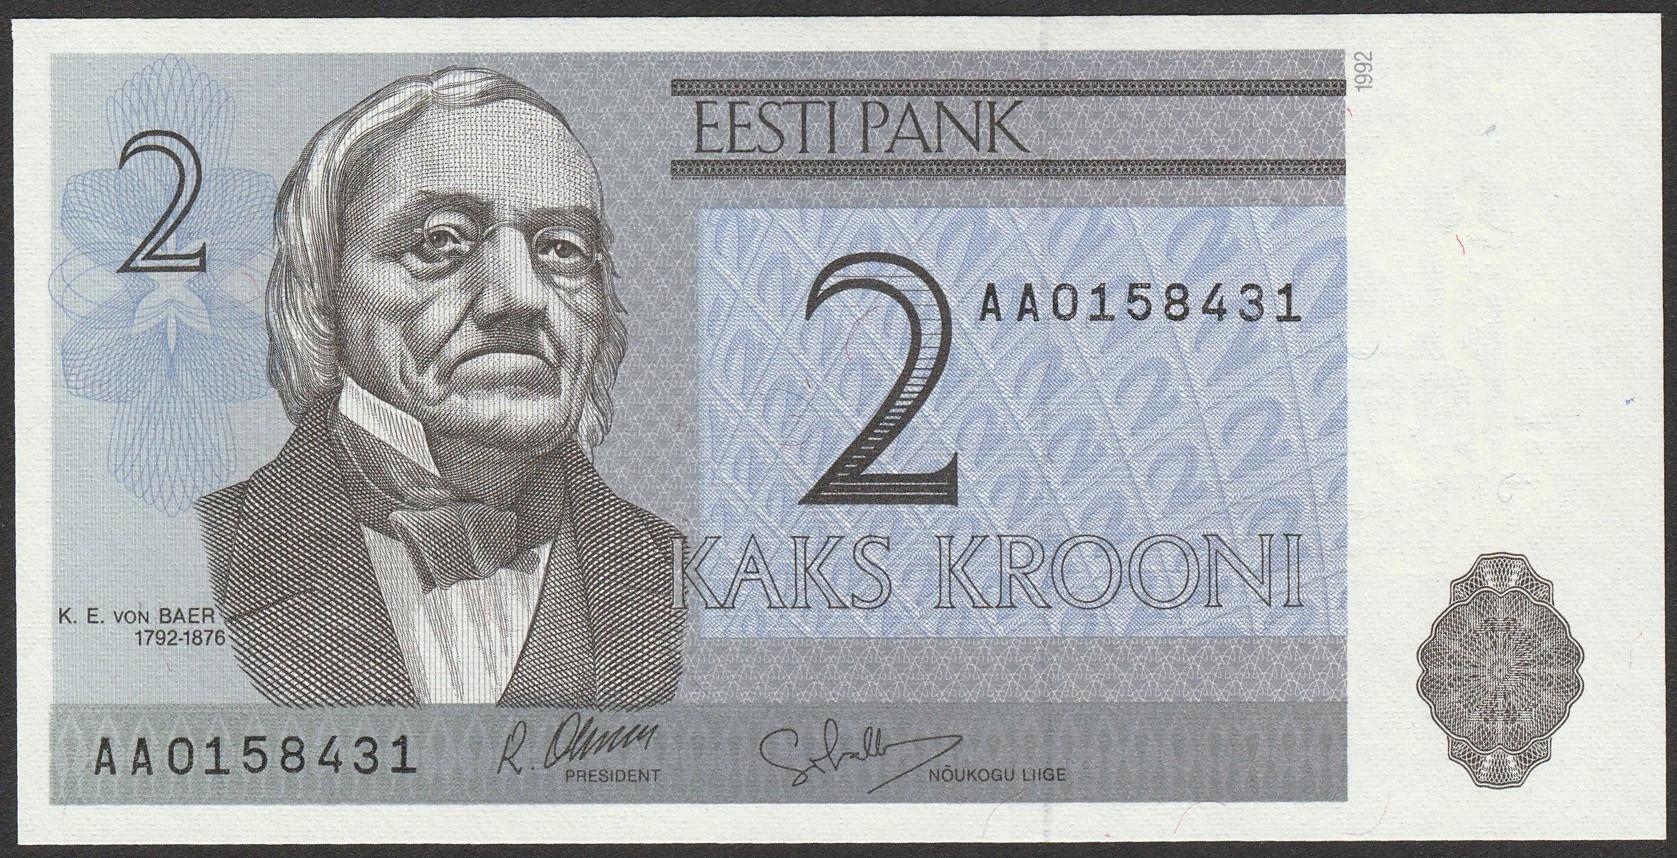 Estonia - 2 korony - 1992 - K.E. v Baer - AA - UNC